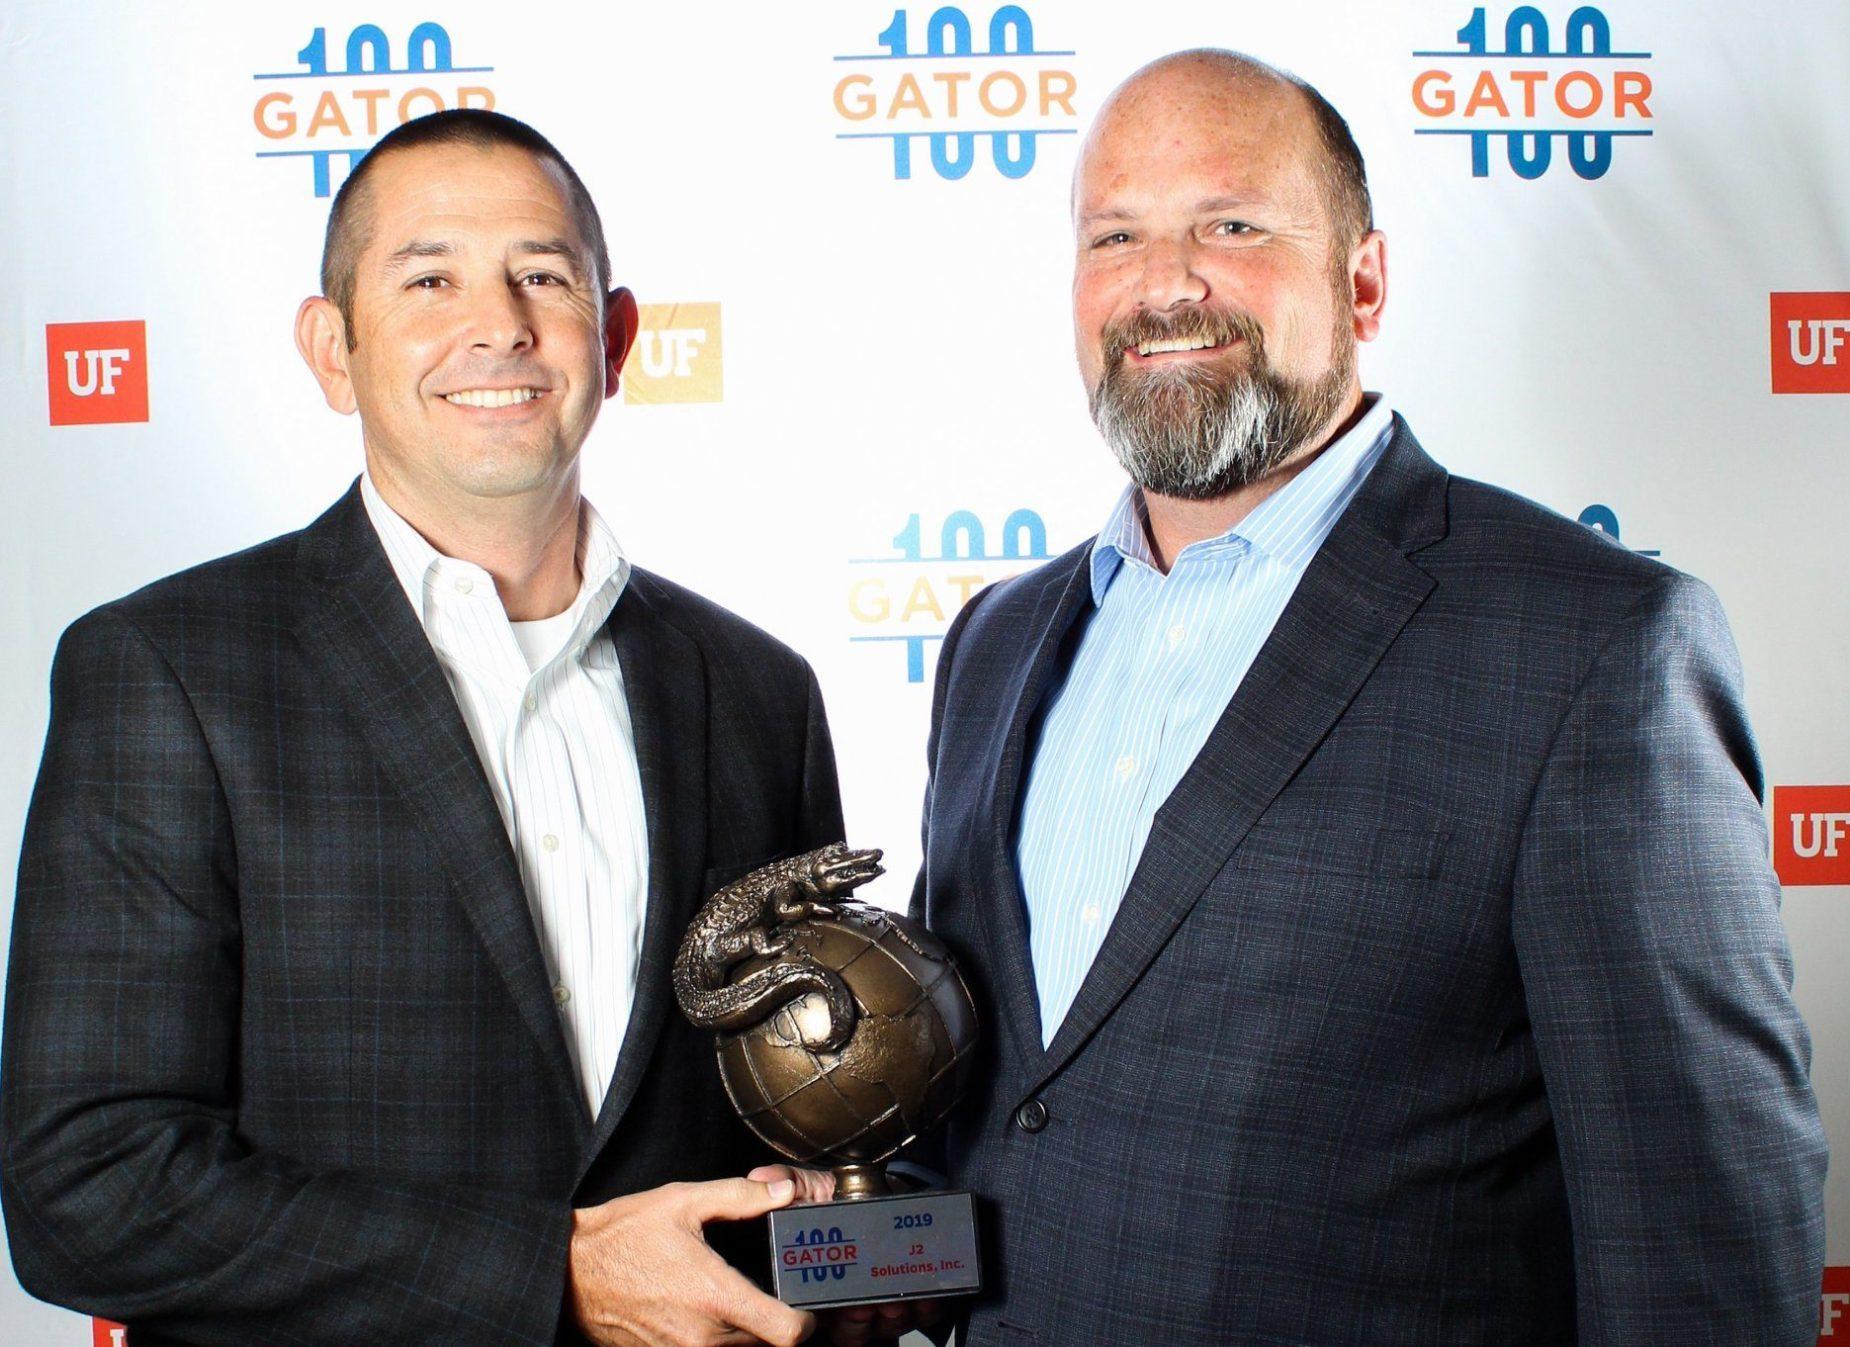 University of Florida Engineering Alumni Honored as 2019 GATOR 100 Awardees